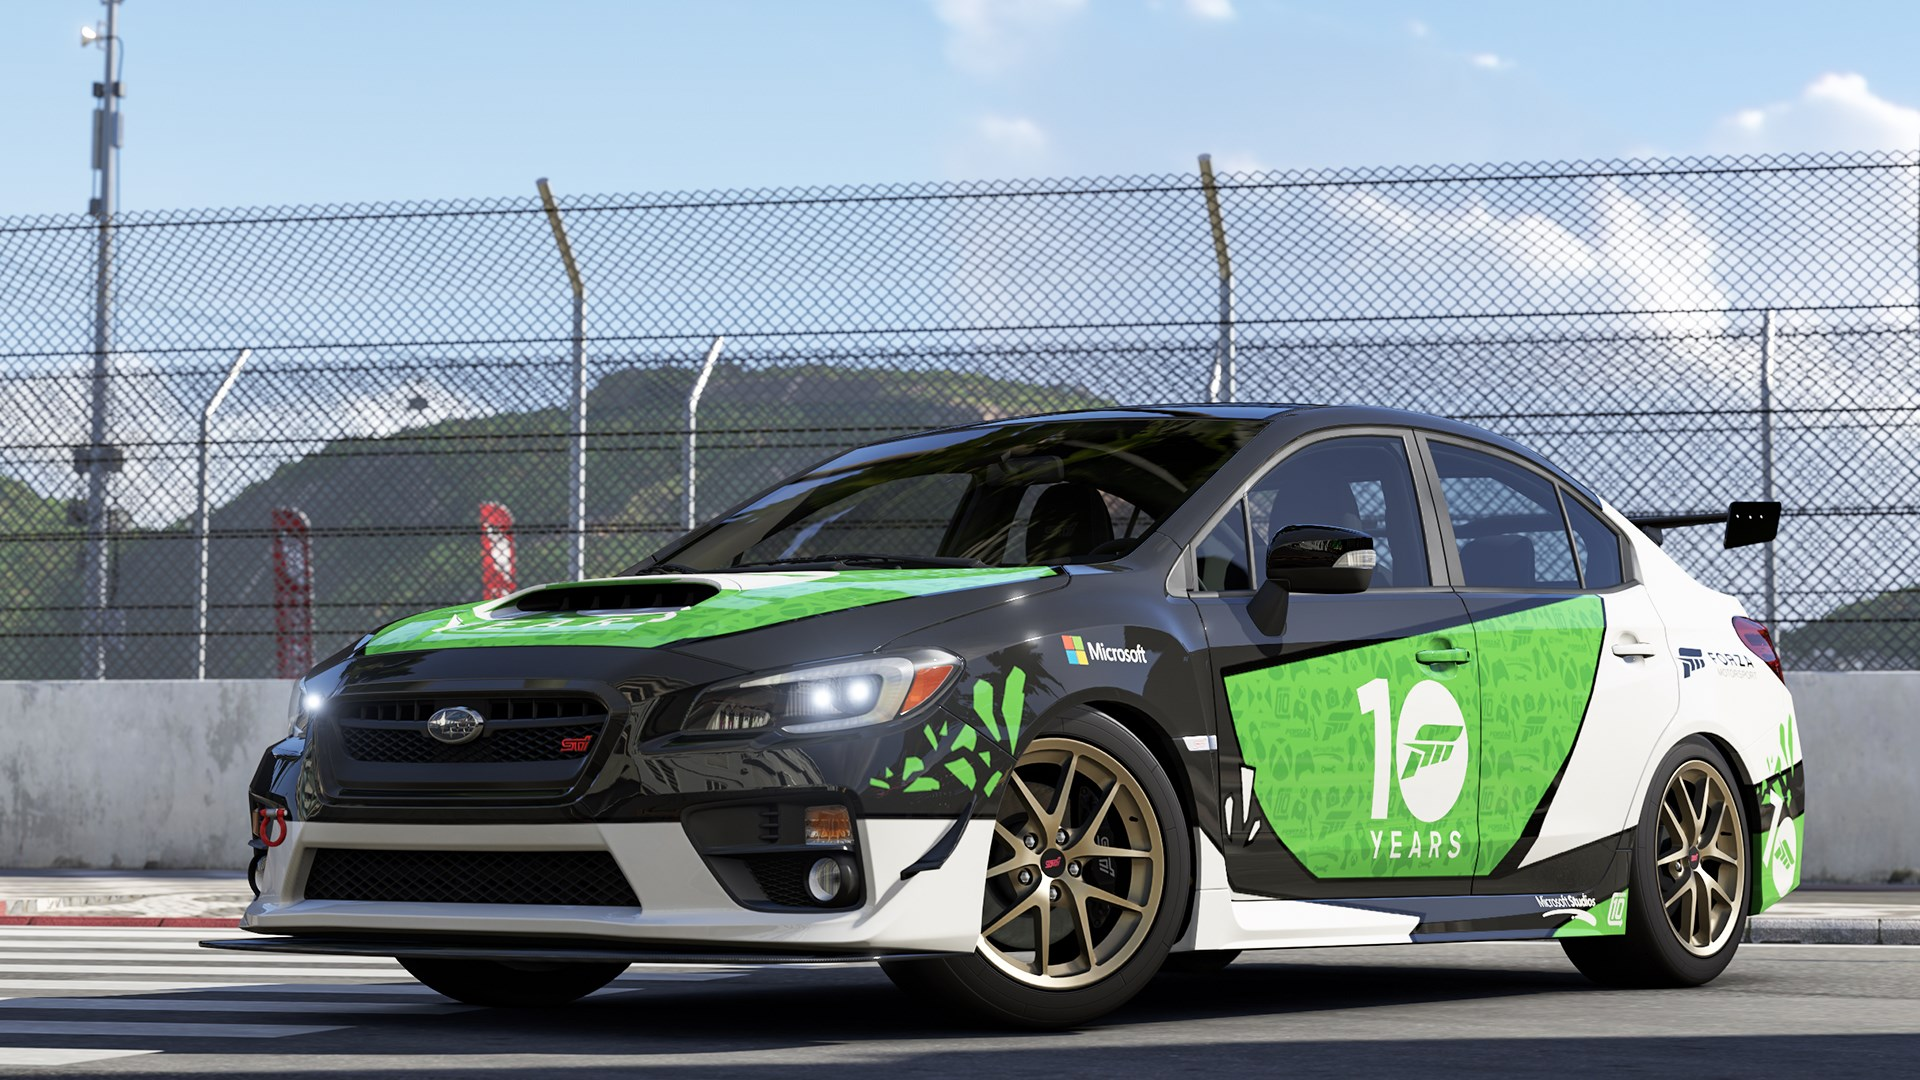 2015 Subaru Team Forza WRX Sti